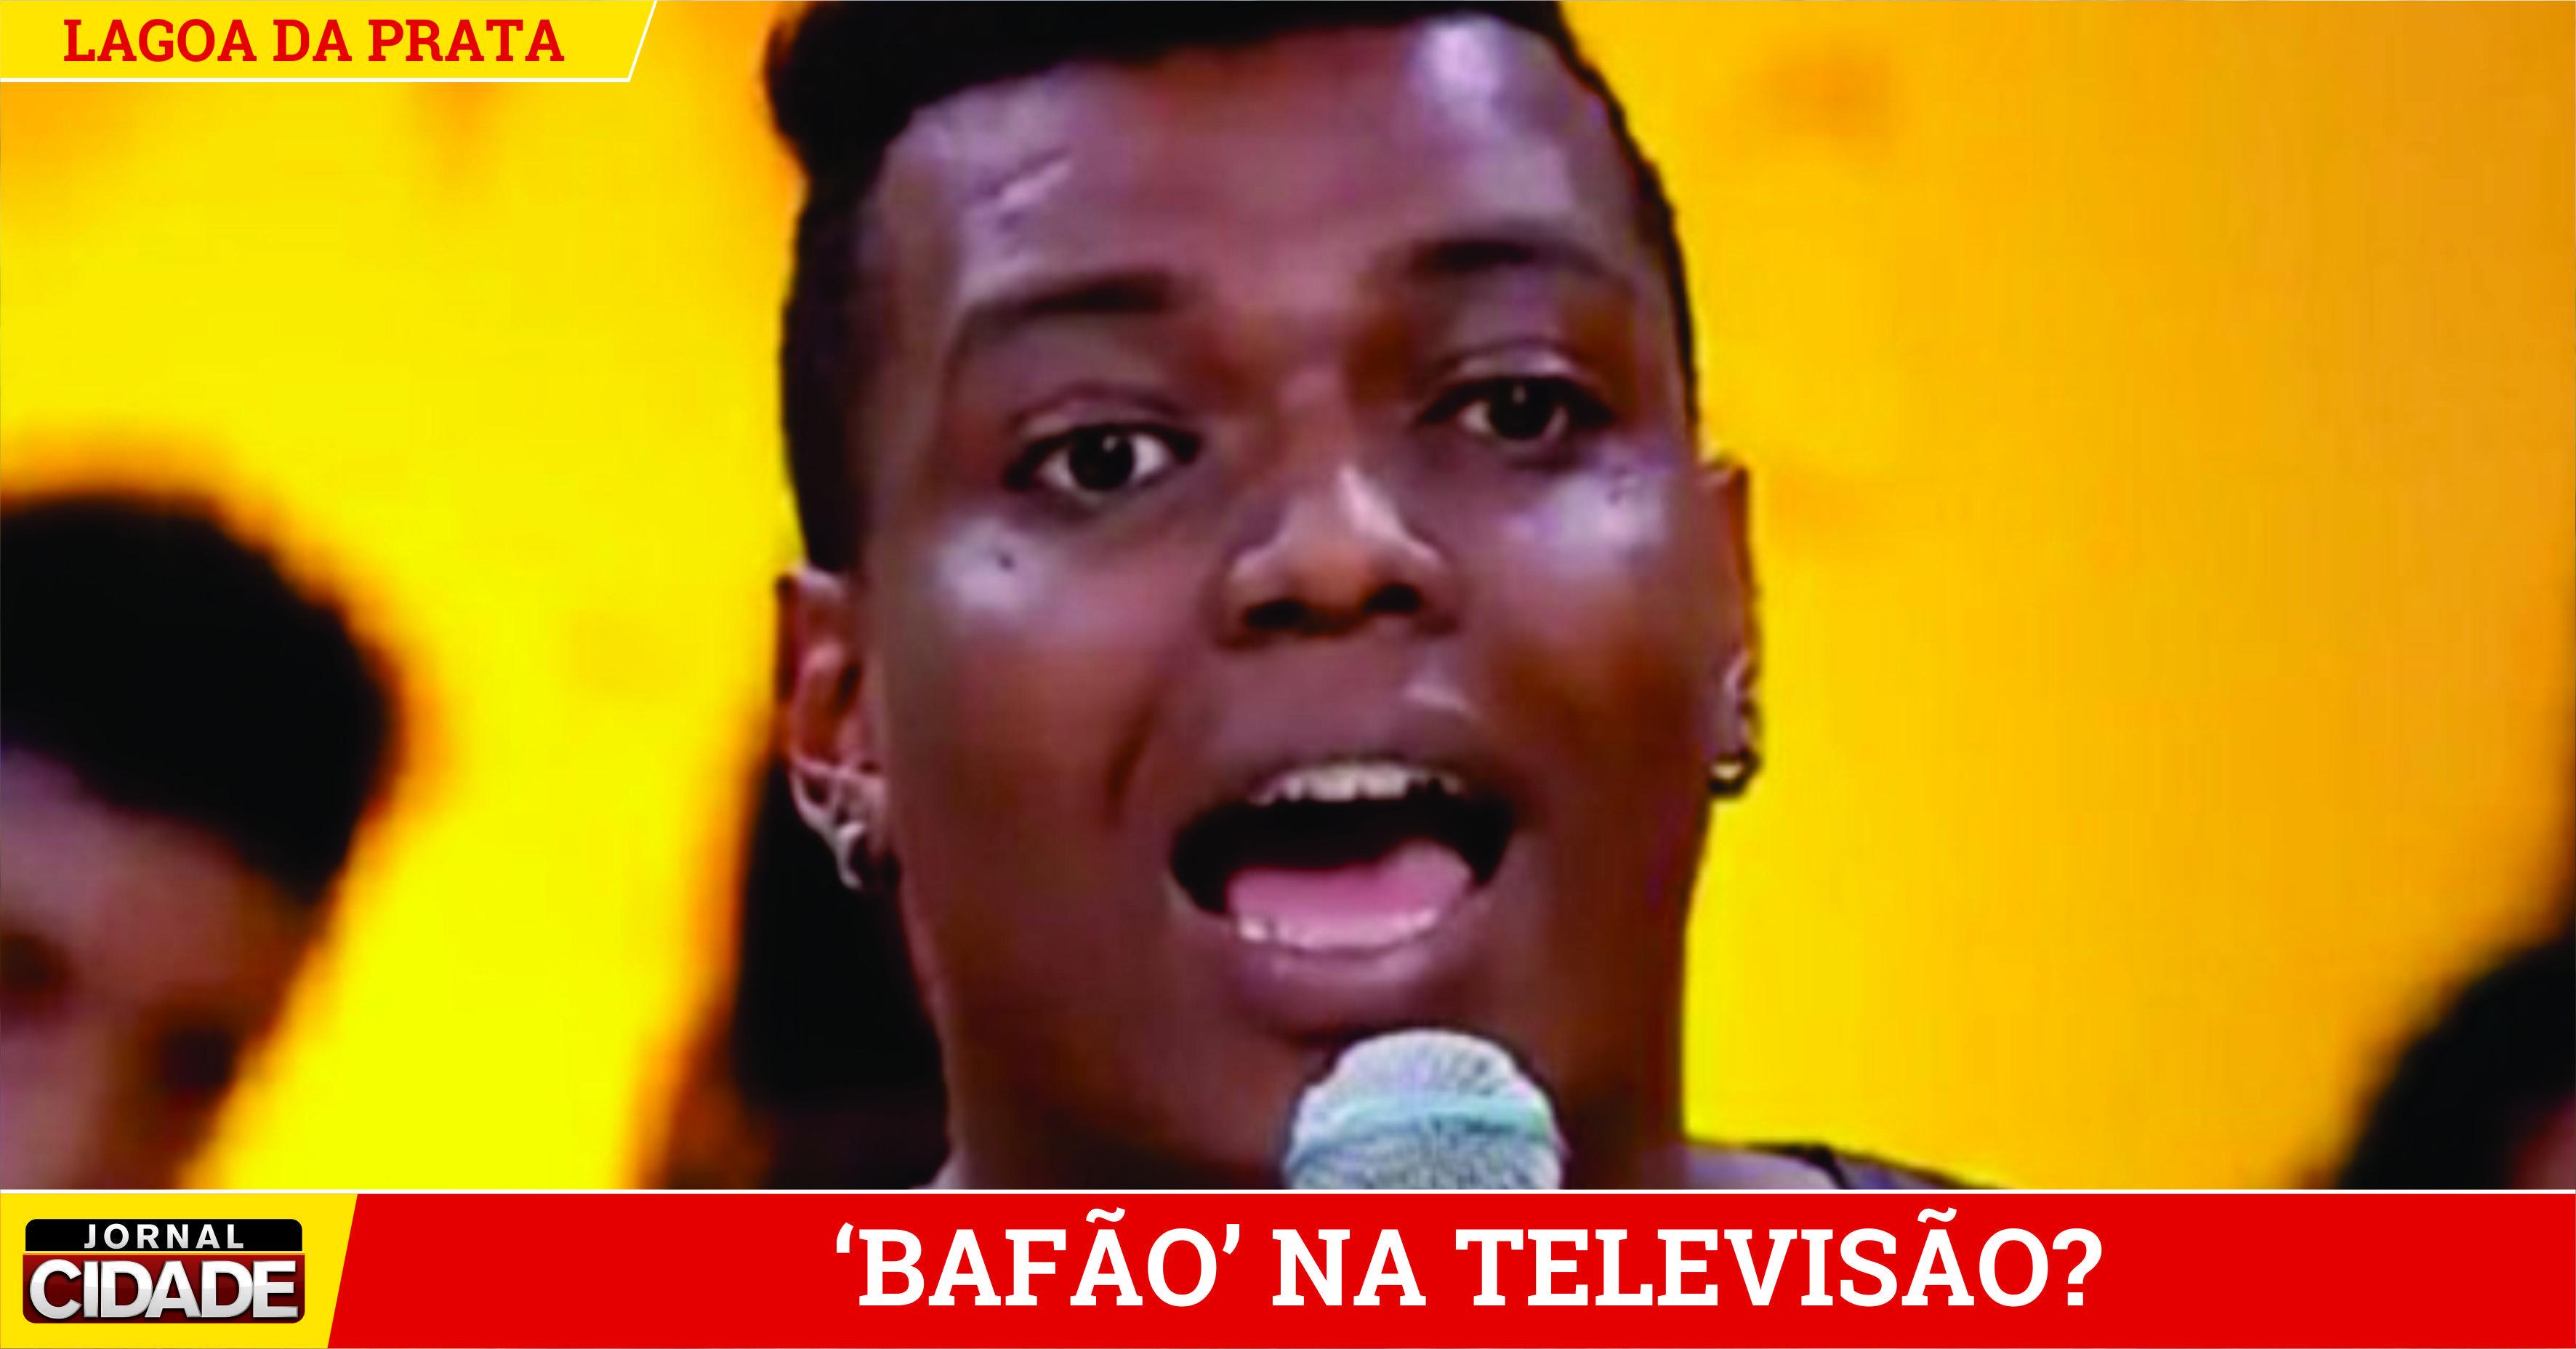 Lagopratense dá bafão em programa de televisão.>http://goo.gl/je4di3